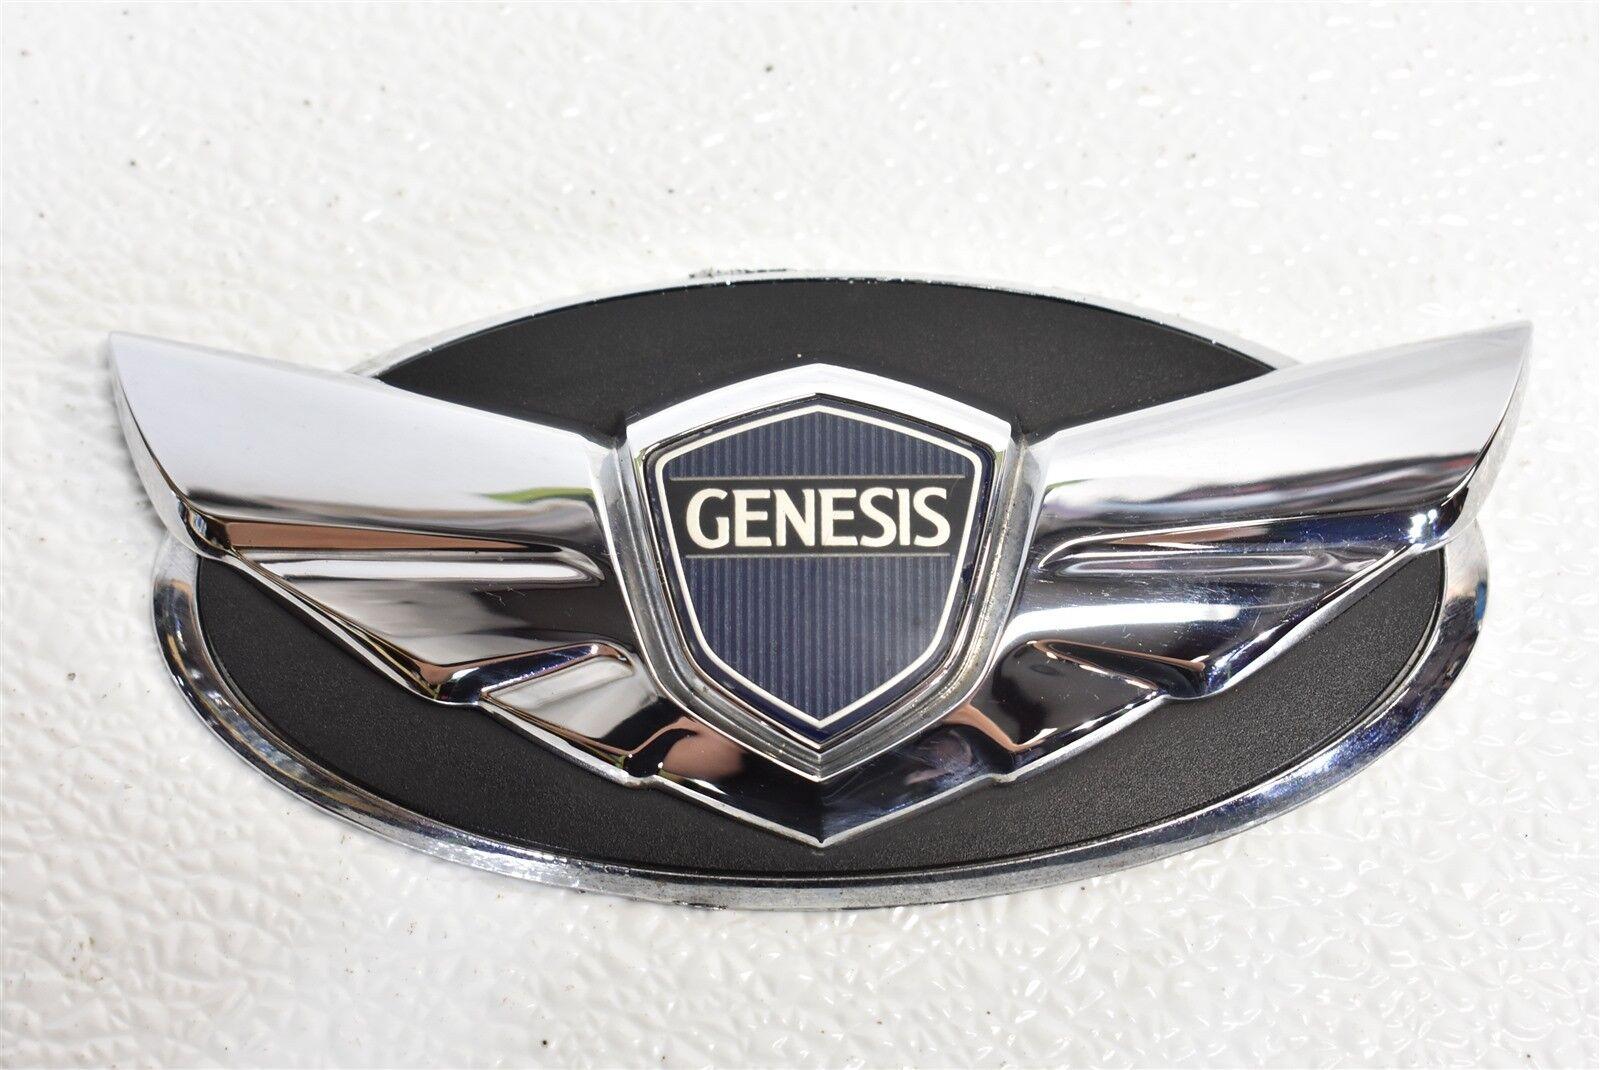 2009 2012 Hyundai Genesis Coupe Badge Emblem 09 12 Ebay